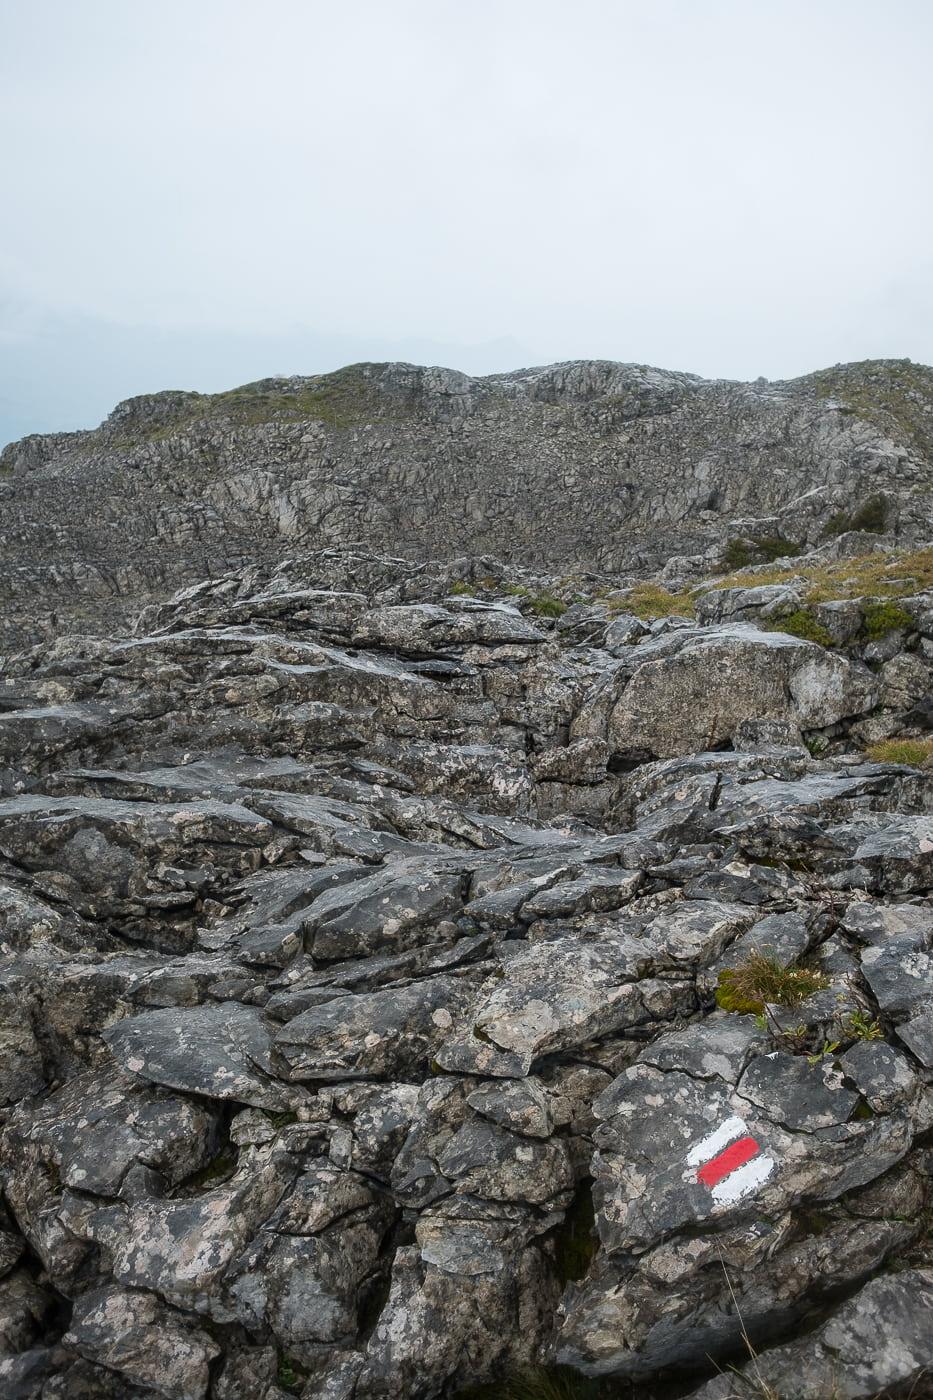 Karstgestein Erosion